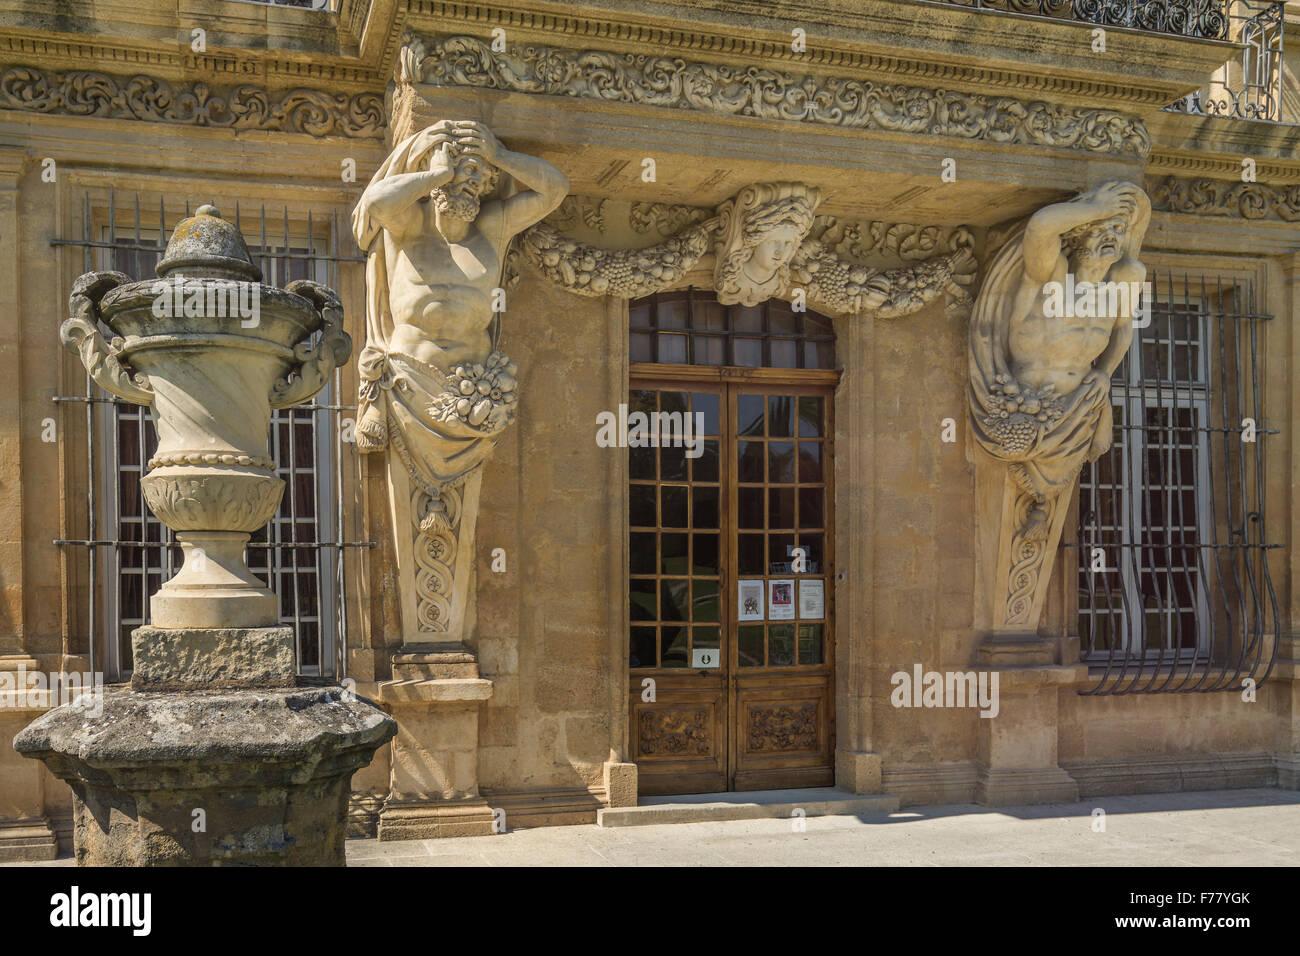 Atlantes, Pavillon Vendome, Aix en Provence, France - Stock Image